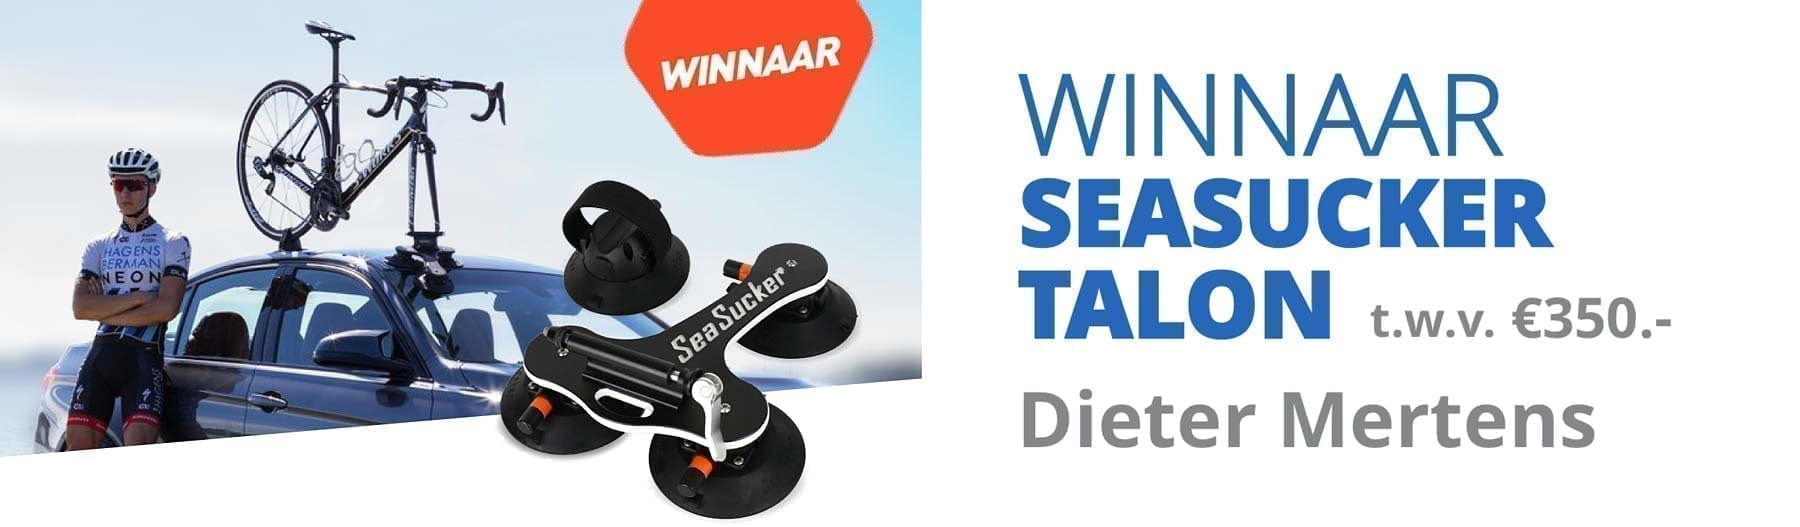 Seasucker Talon – Winnaar Actie T.W.V. € 350,00 !